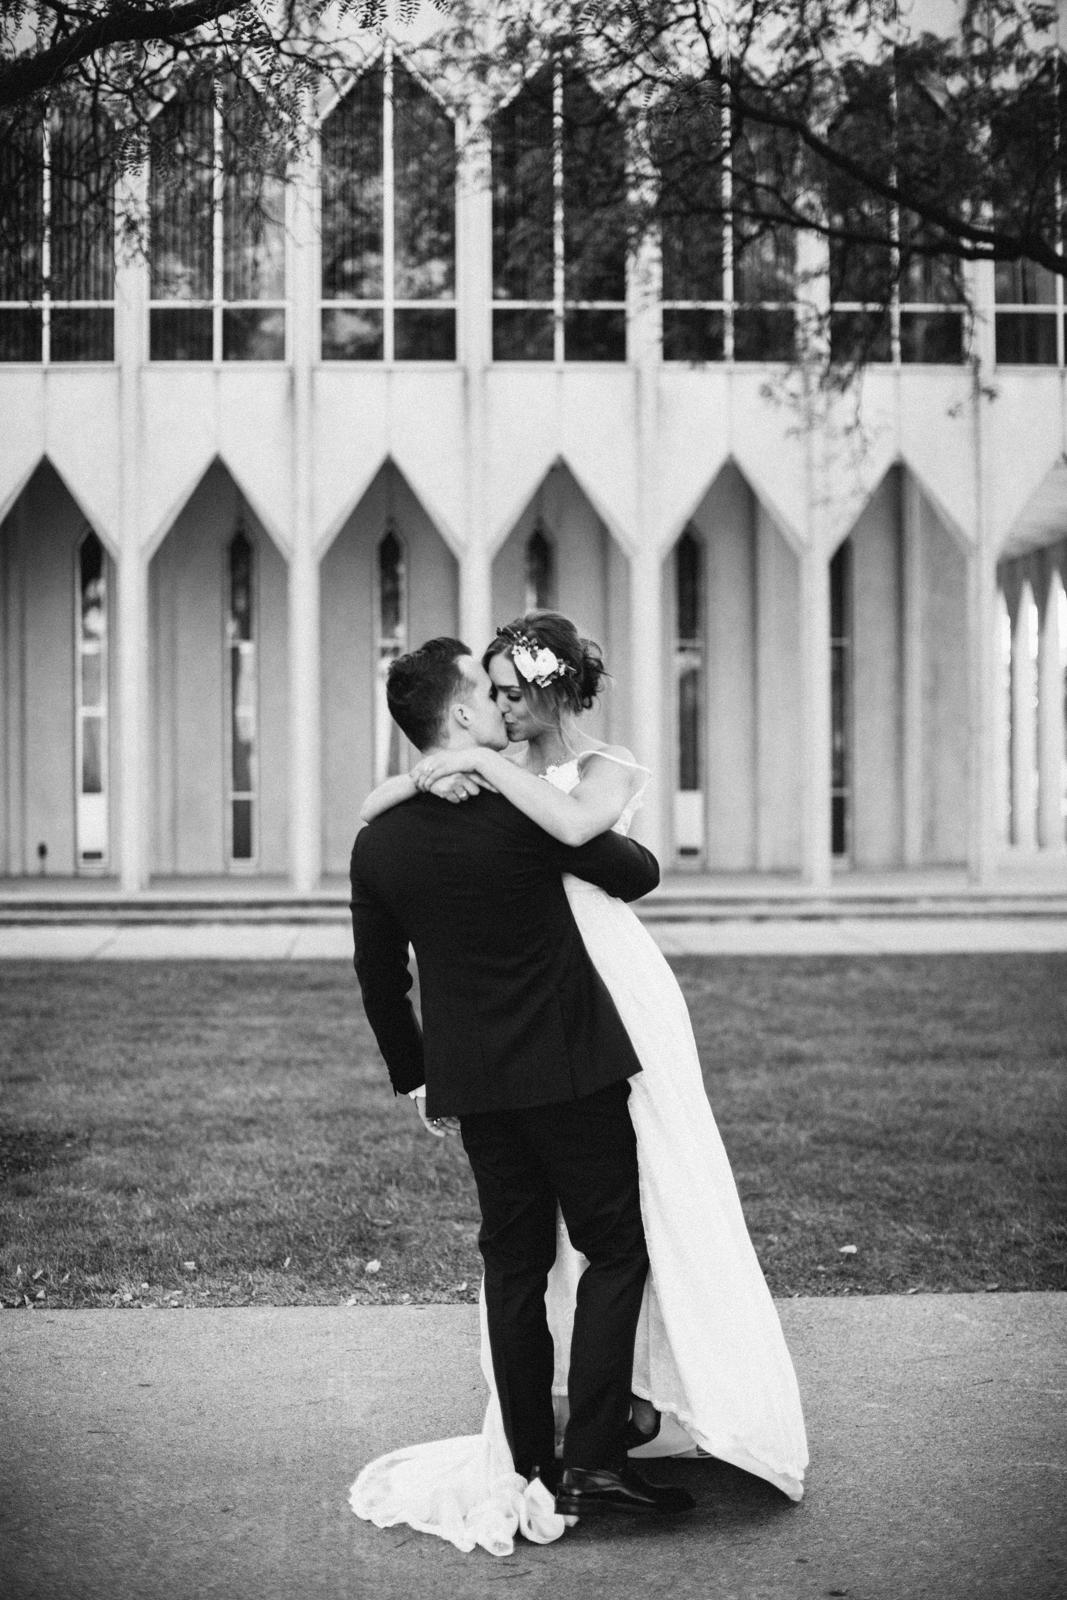 BeanandCole.com-Chris&JackieJohnson-Wedding-147.jpg